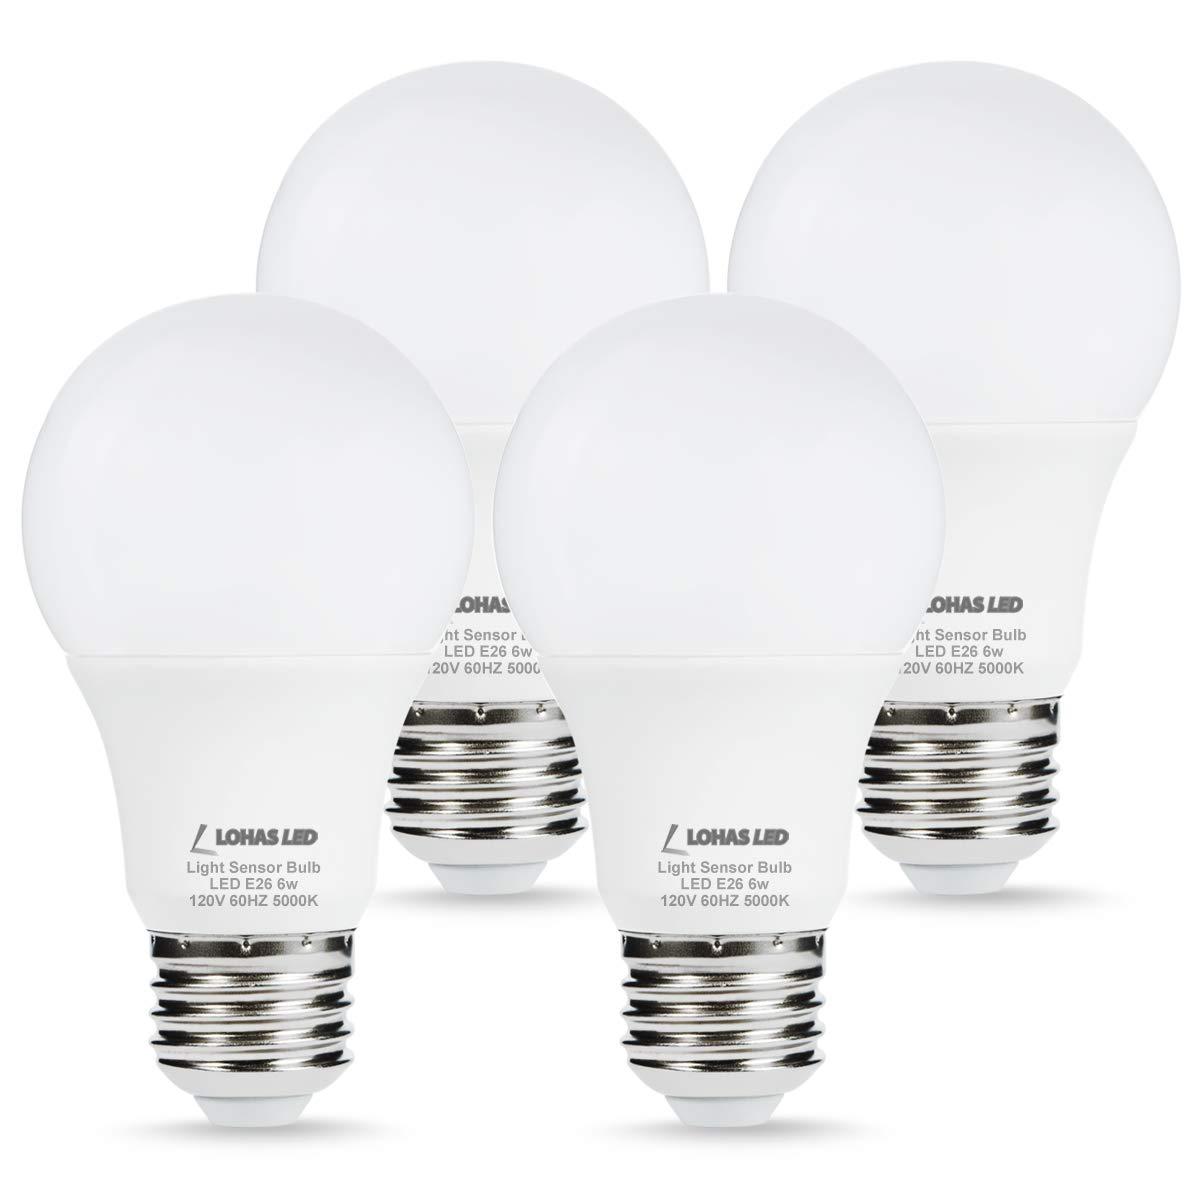 LOHAS Sensor Light Dusk till Dawn LED Bulb, Light Sensor Porch Light Bulbs, A19 6W Daylight 5000K E26 LED Security Bulb(Auto on/off), Smart Indoor/Outdoor Lamp Lighting for Garage, Hallway(4 Pack)